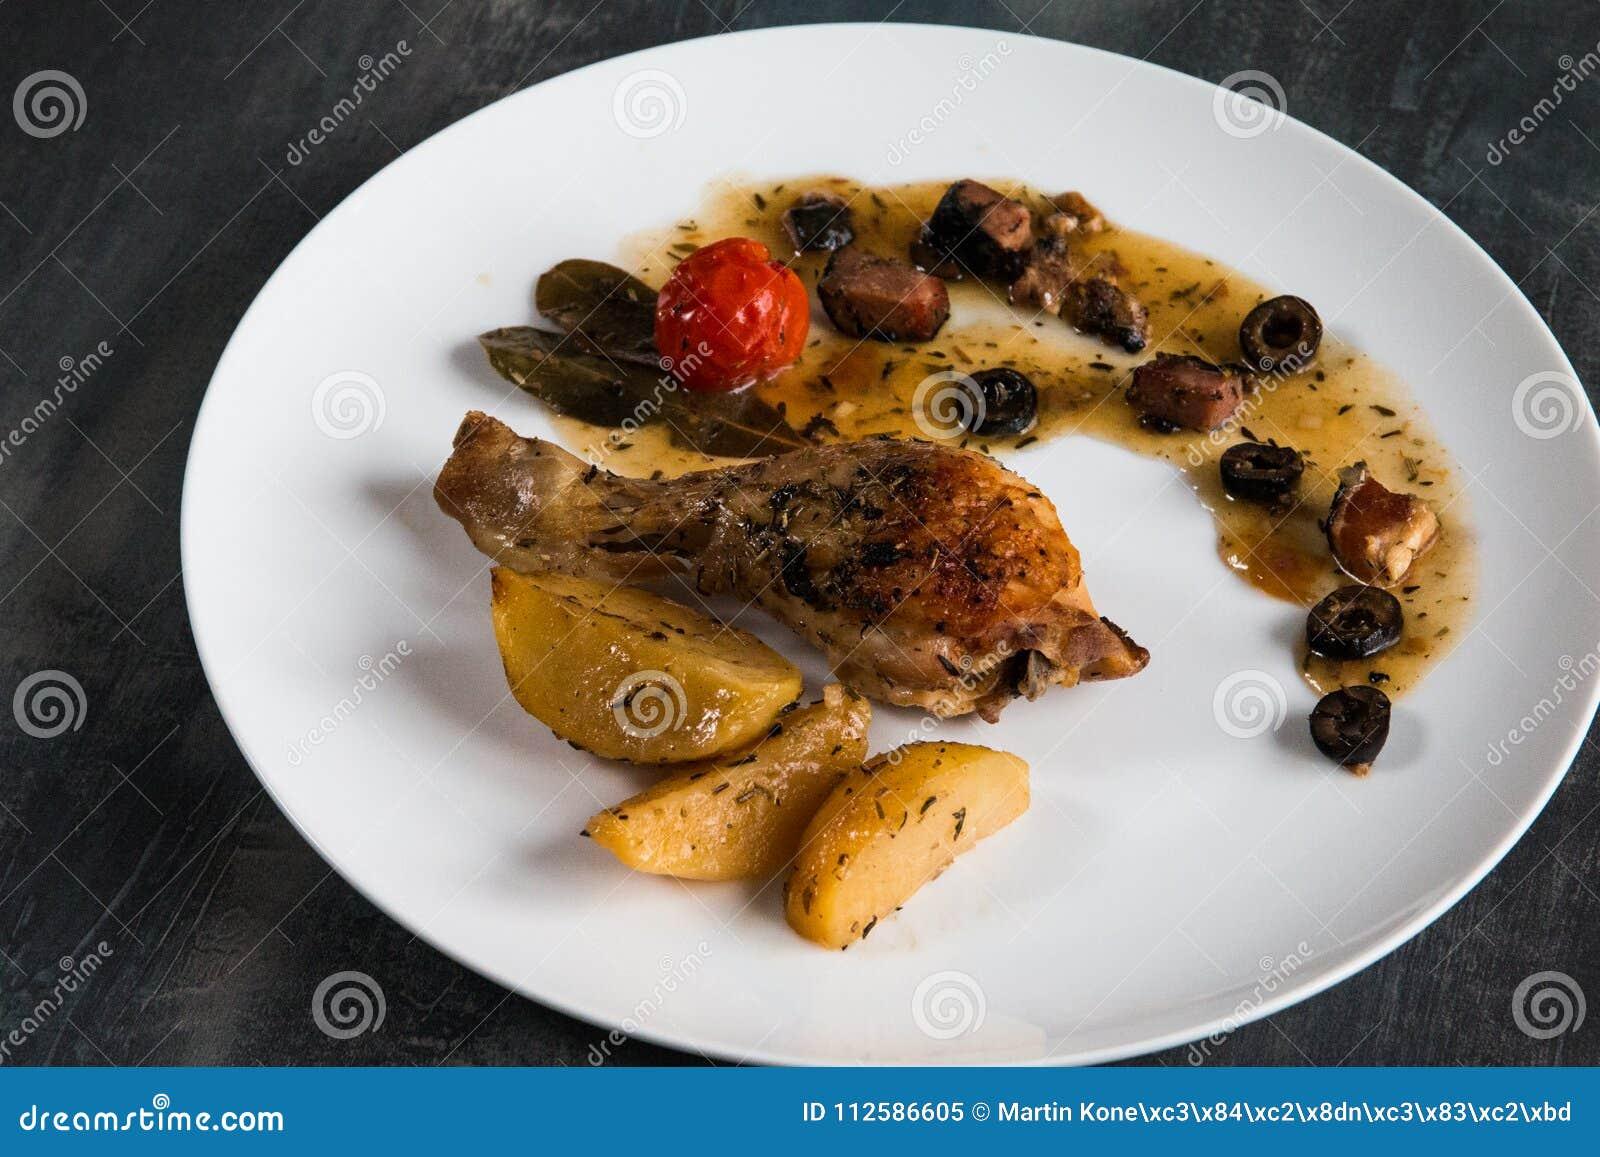 Chicken Provencal homemade